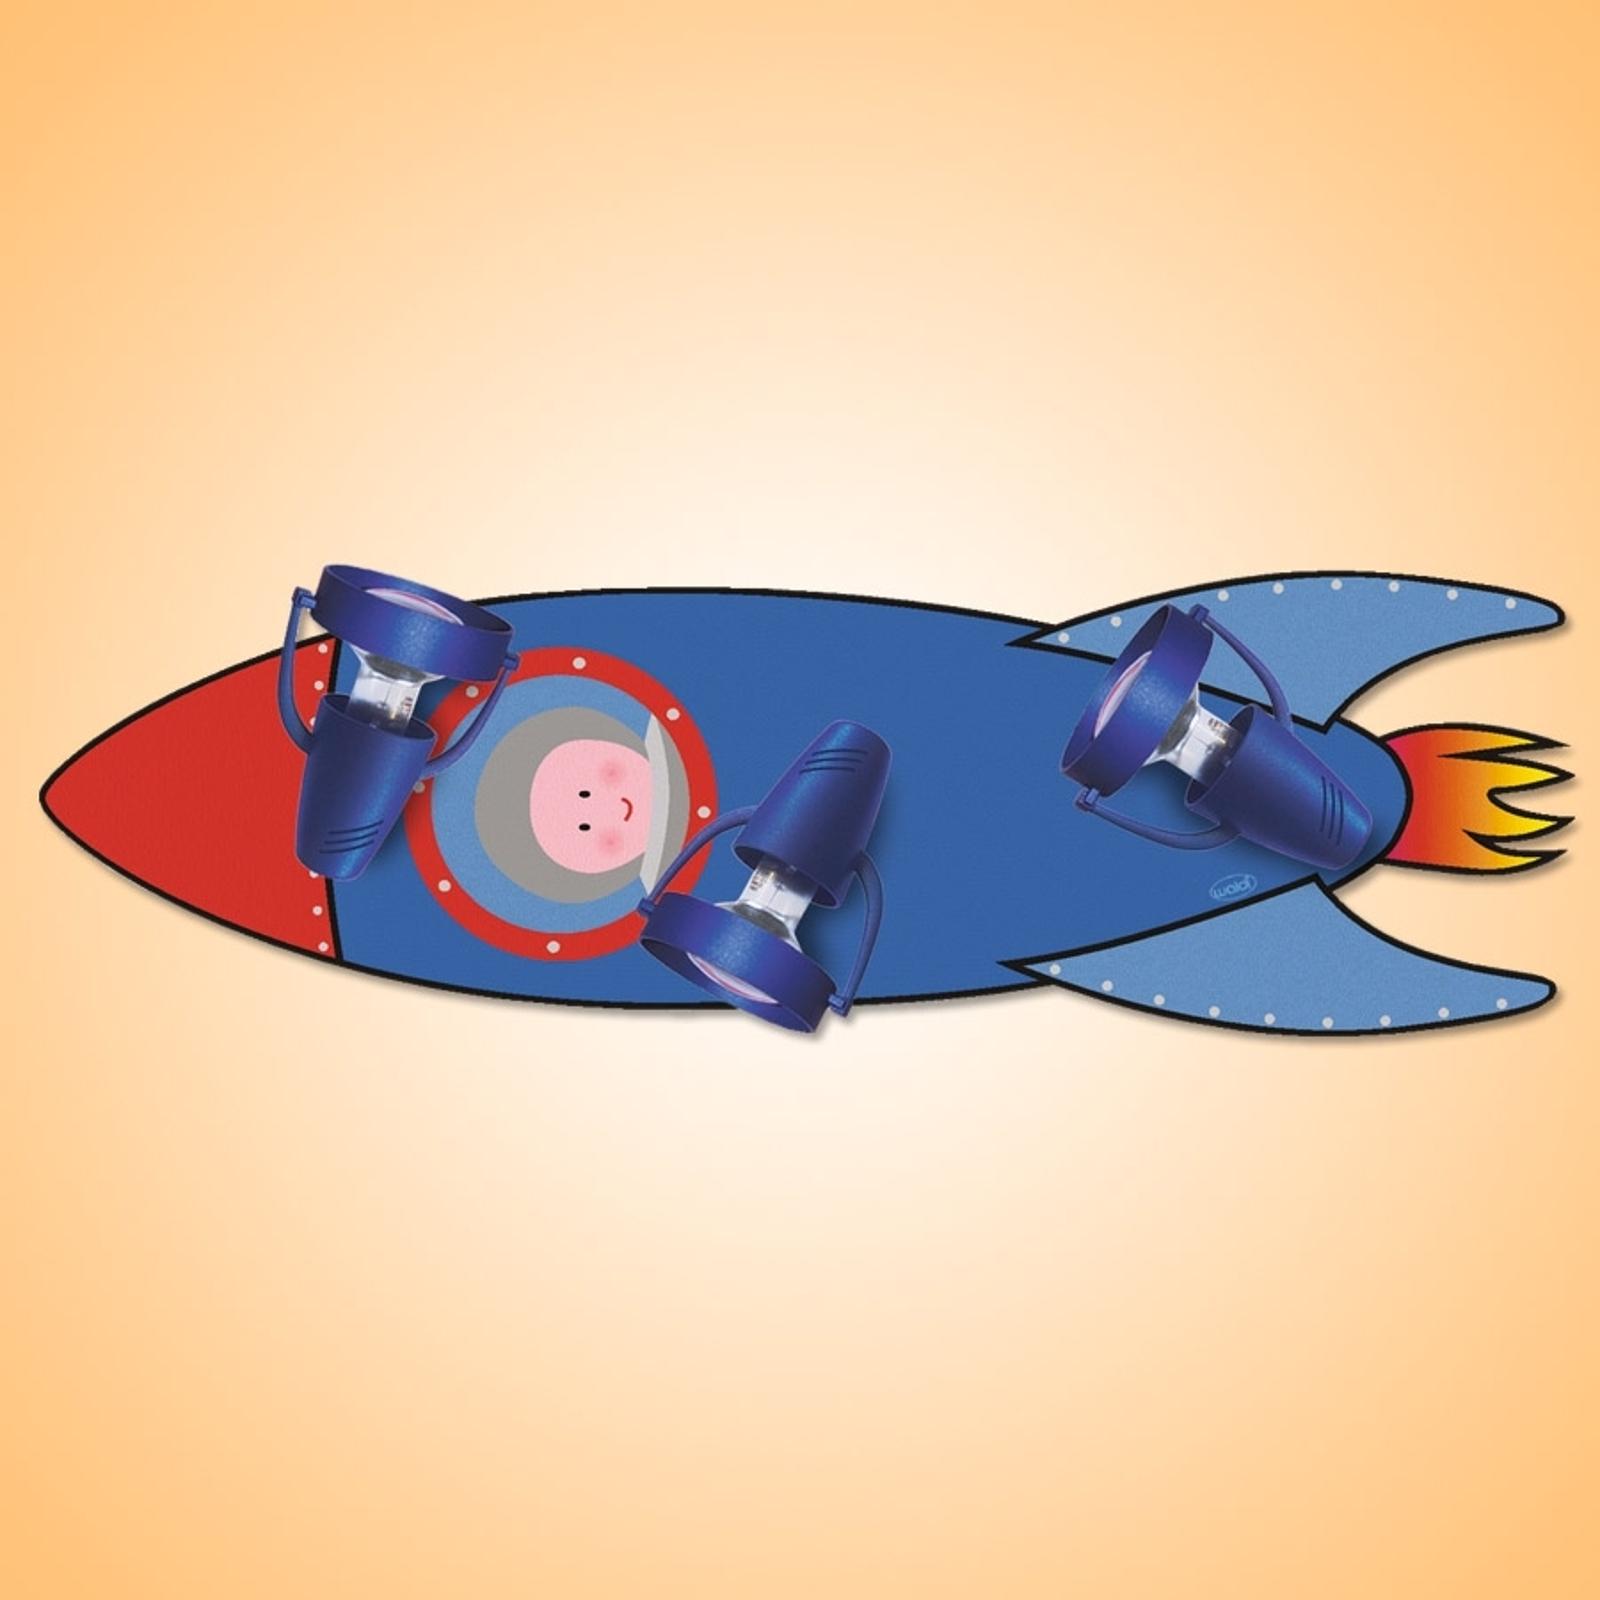 RAKKET, plafondlamp v.d. kinderkamer, blauw - rood